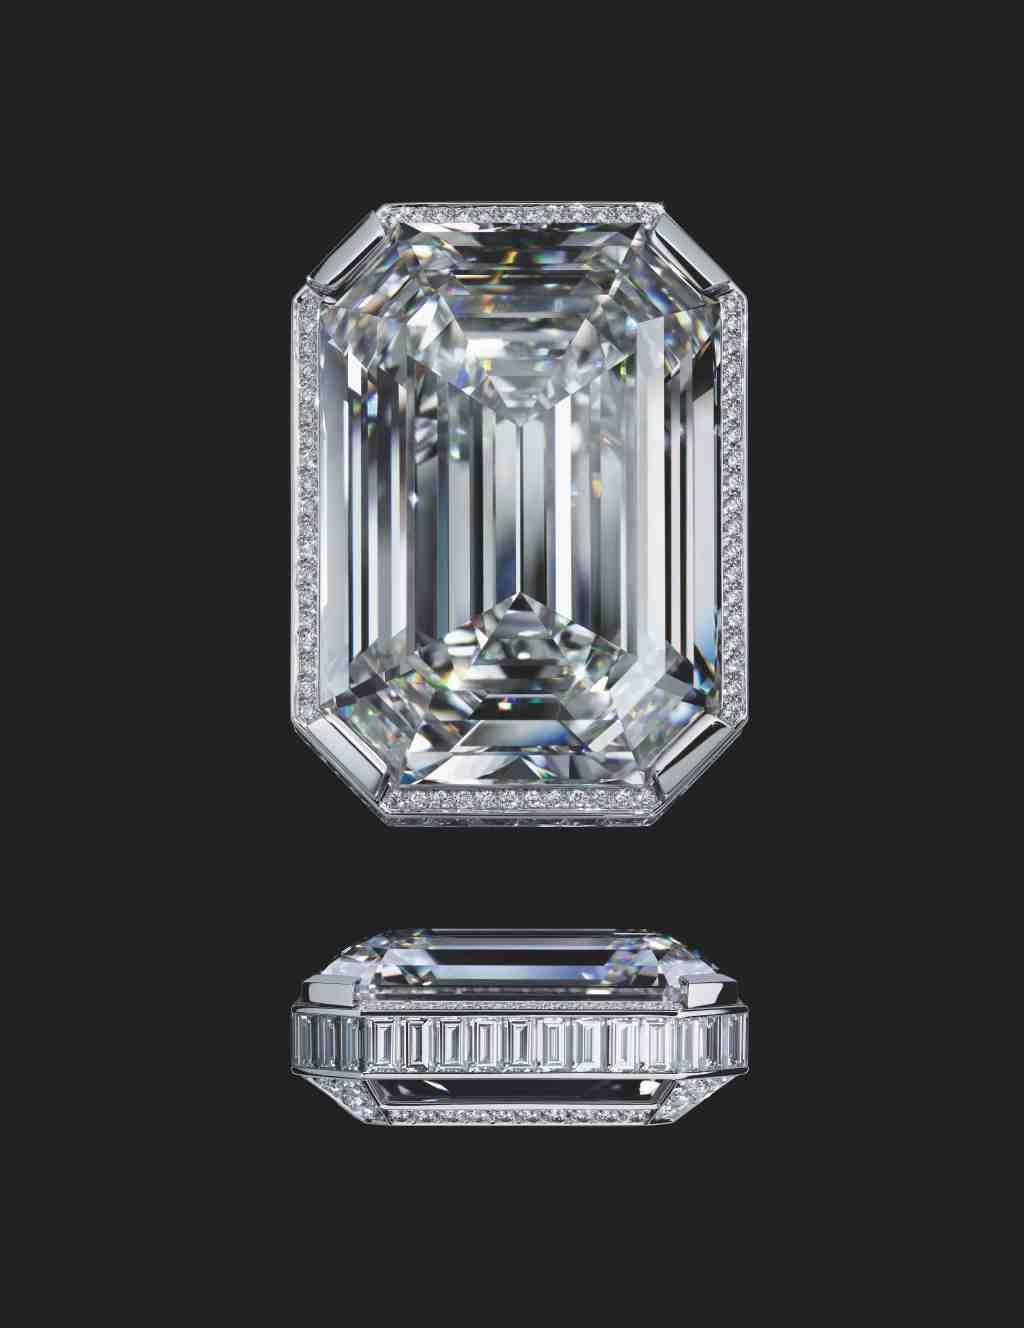 Chanel's 55.55 carat diamond